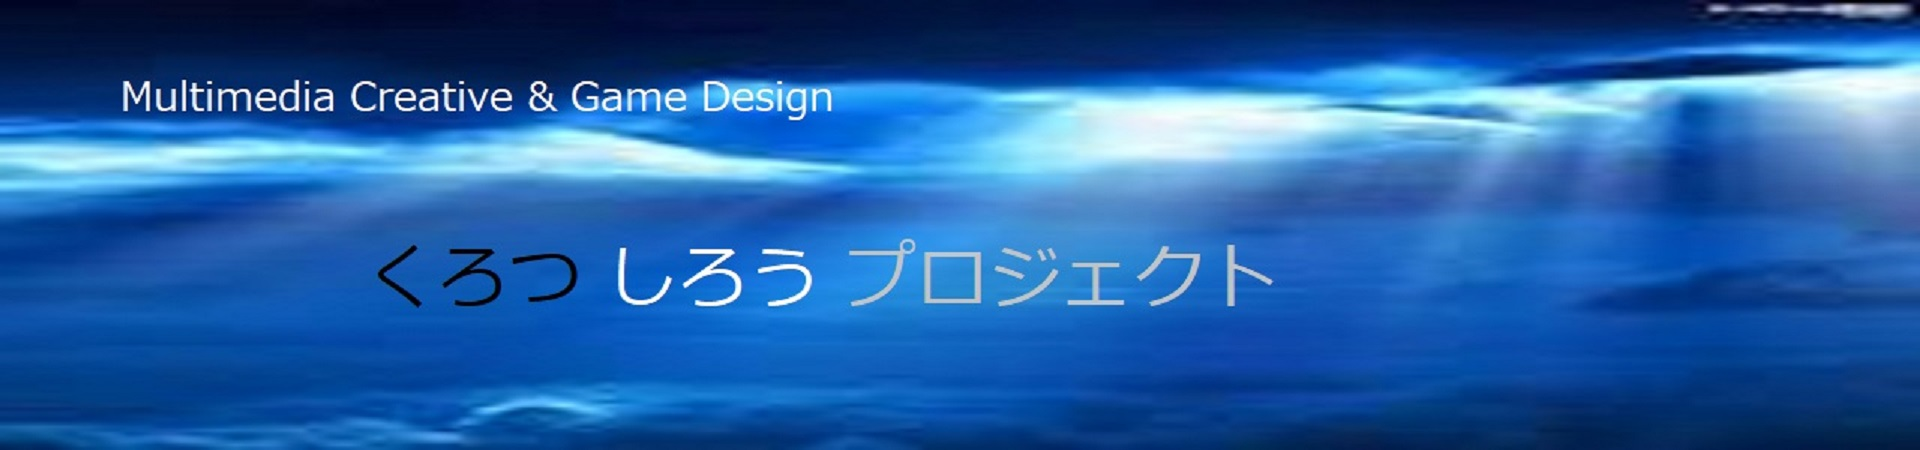 image-board